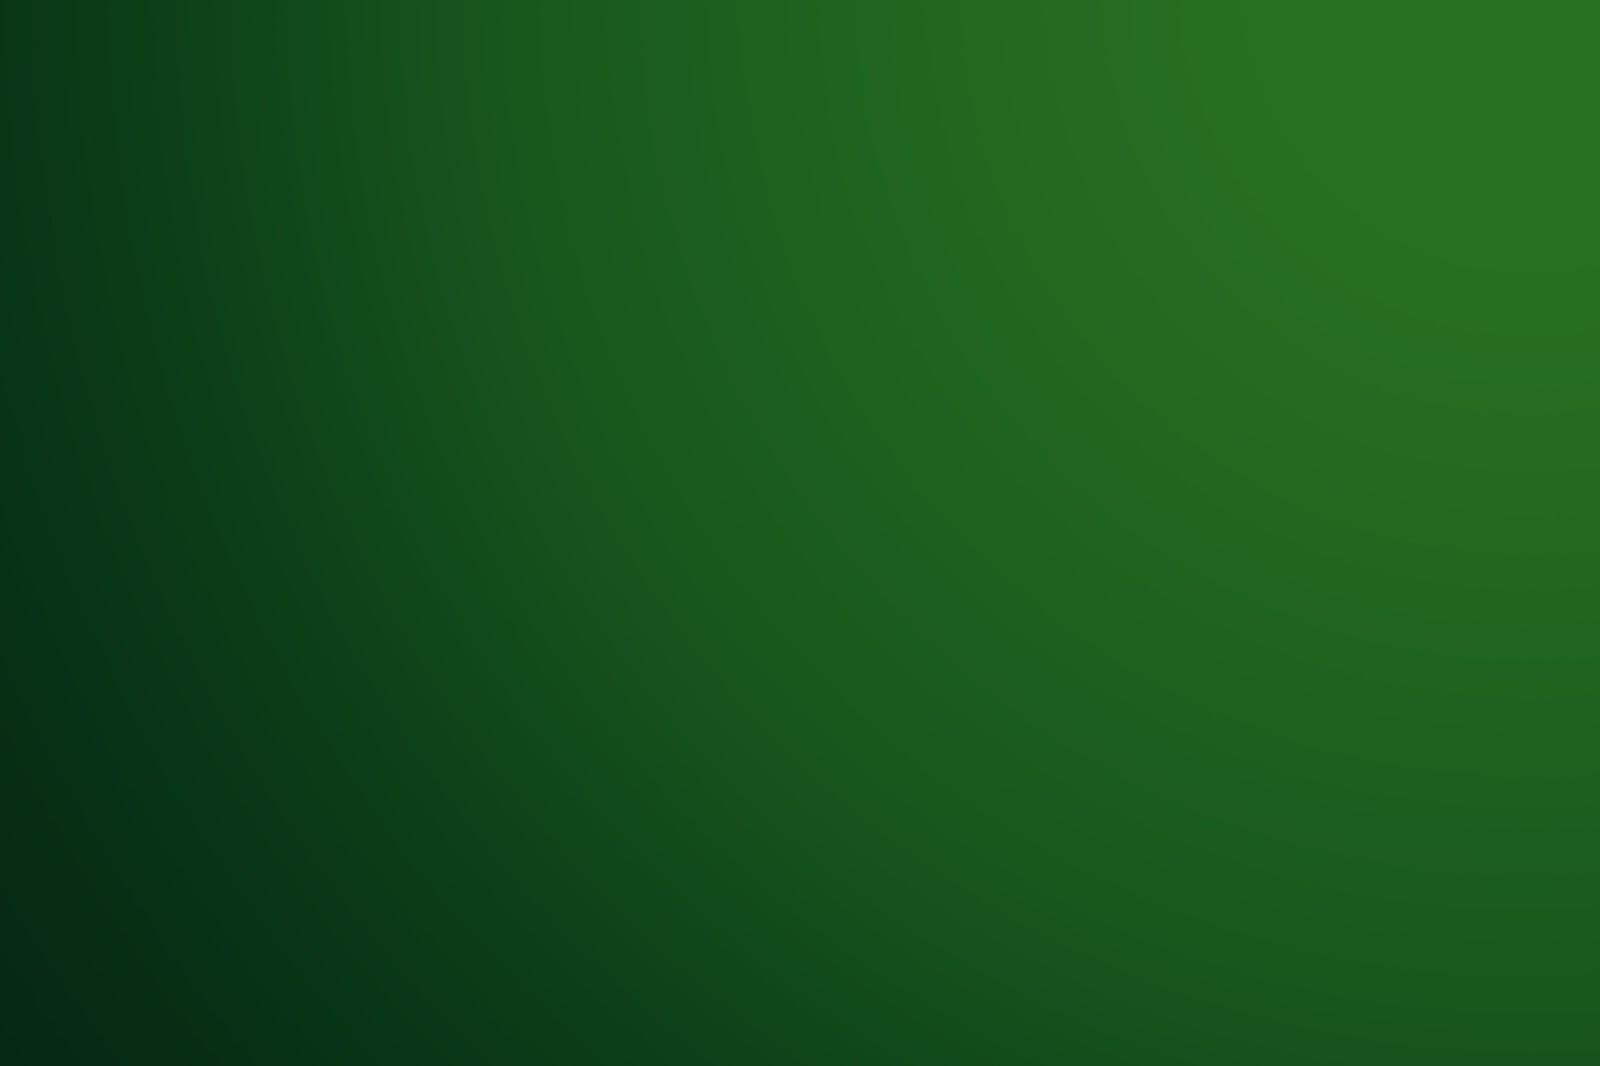 Unduh 8800 Koleksi Background Hijau Nu Gratis Terbaru